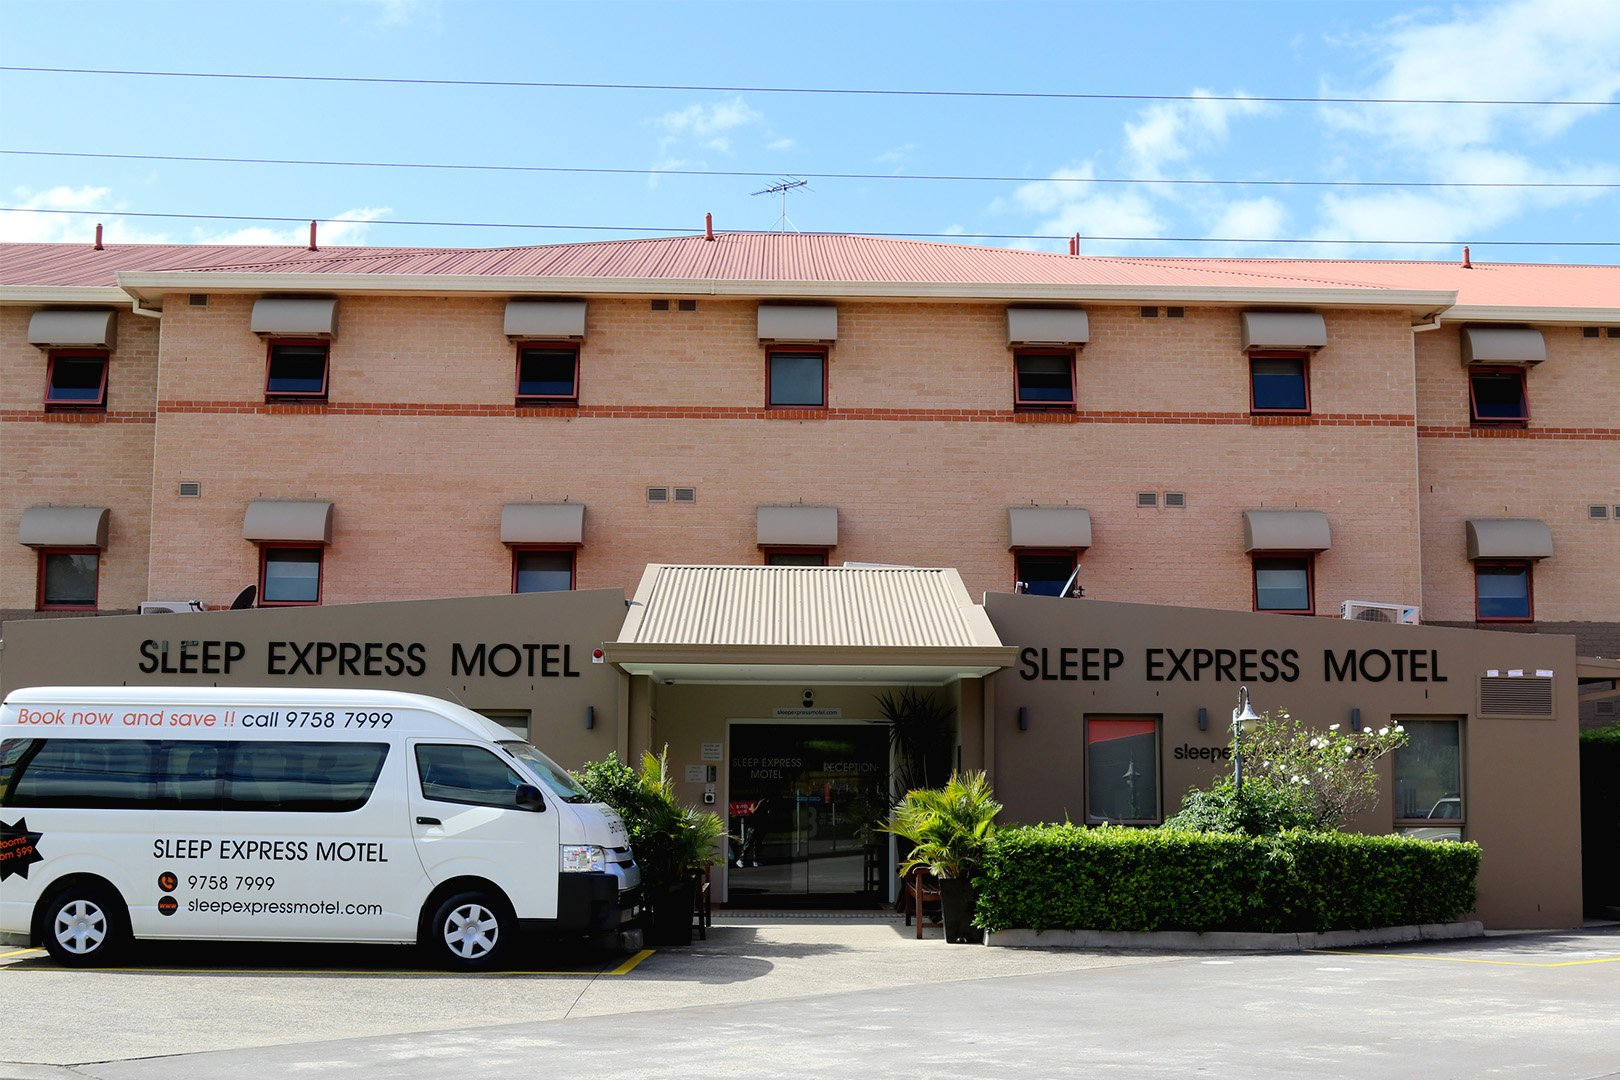 Sleep Express Motel